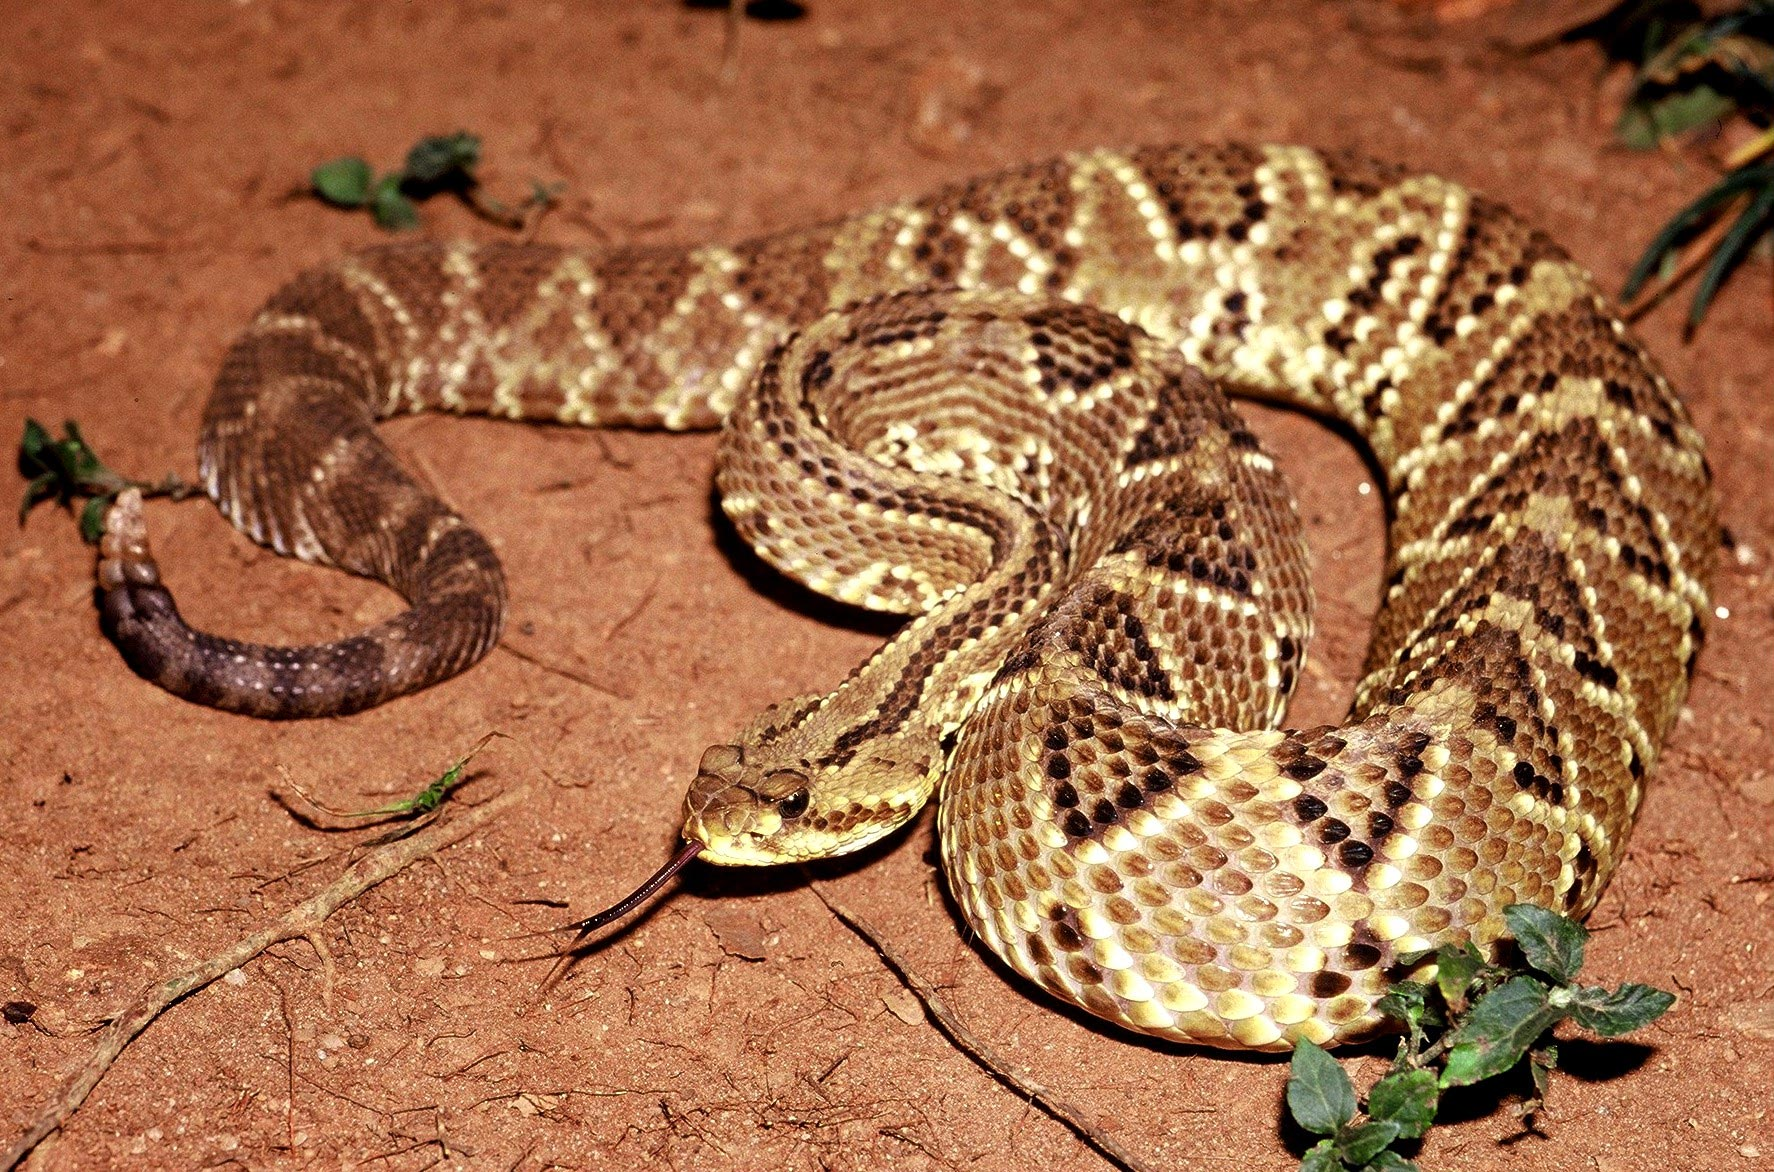 Toxin From Rattlesnake Venom Formulated to Treat Chronic Pain